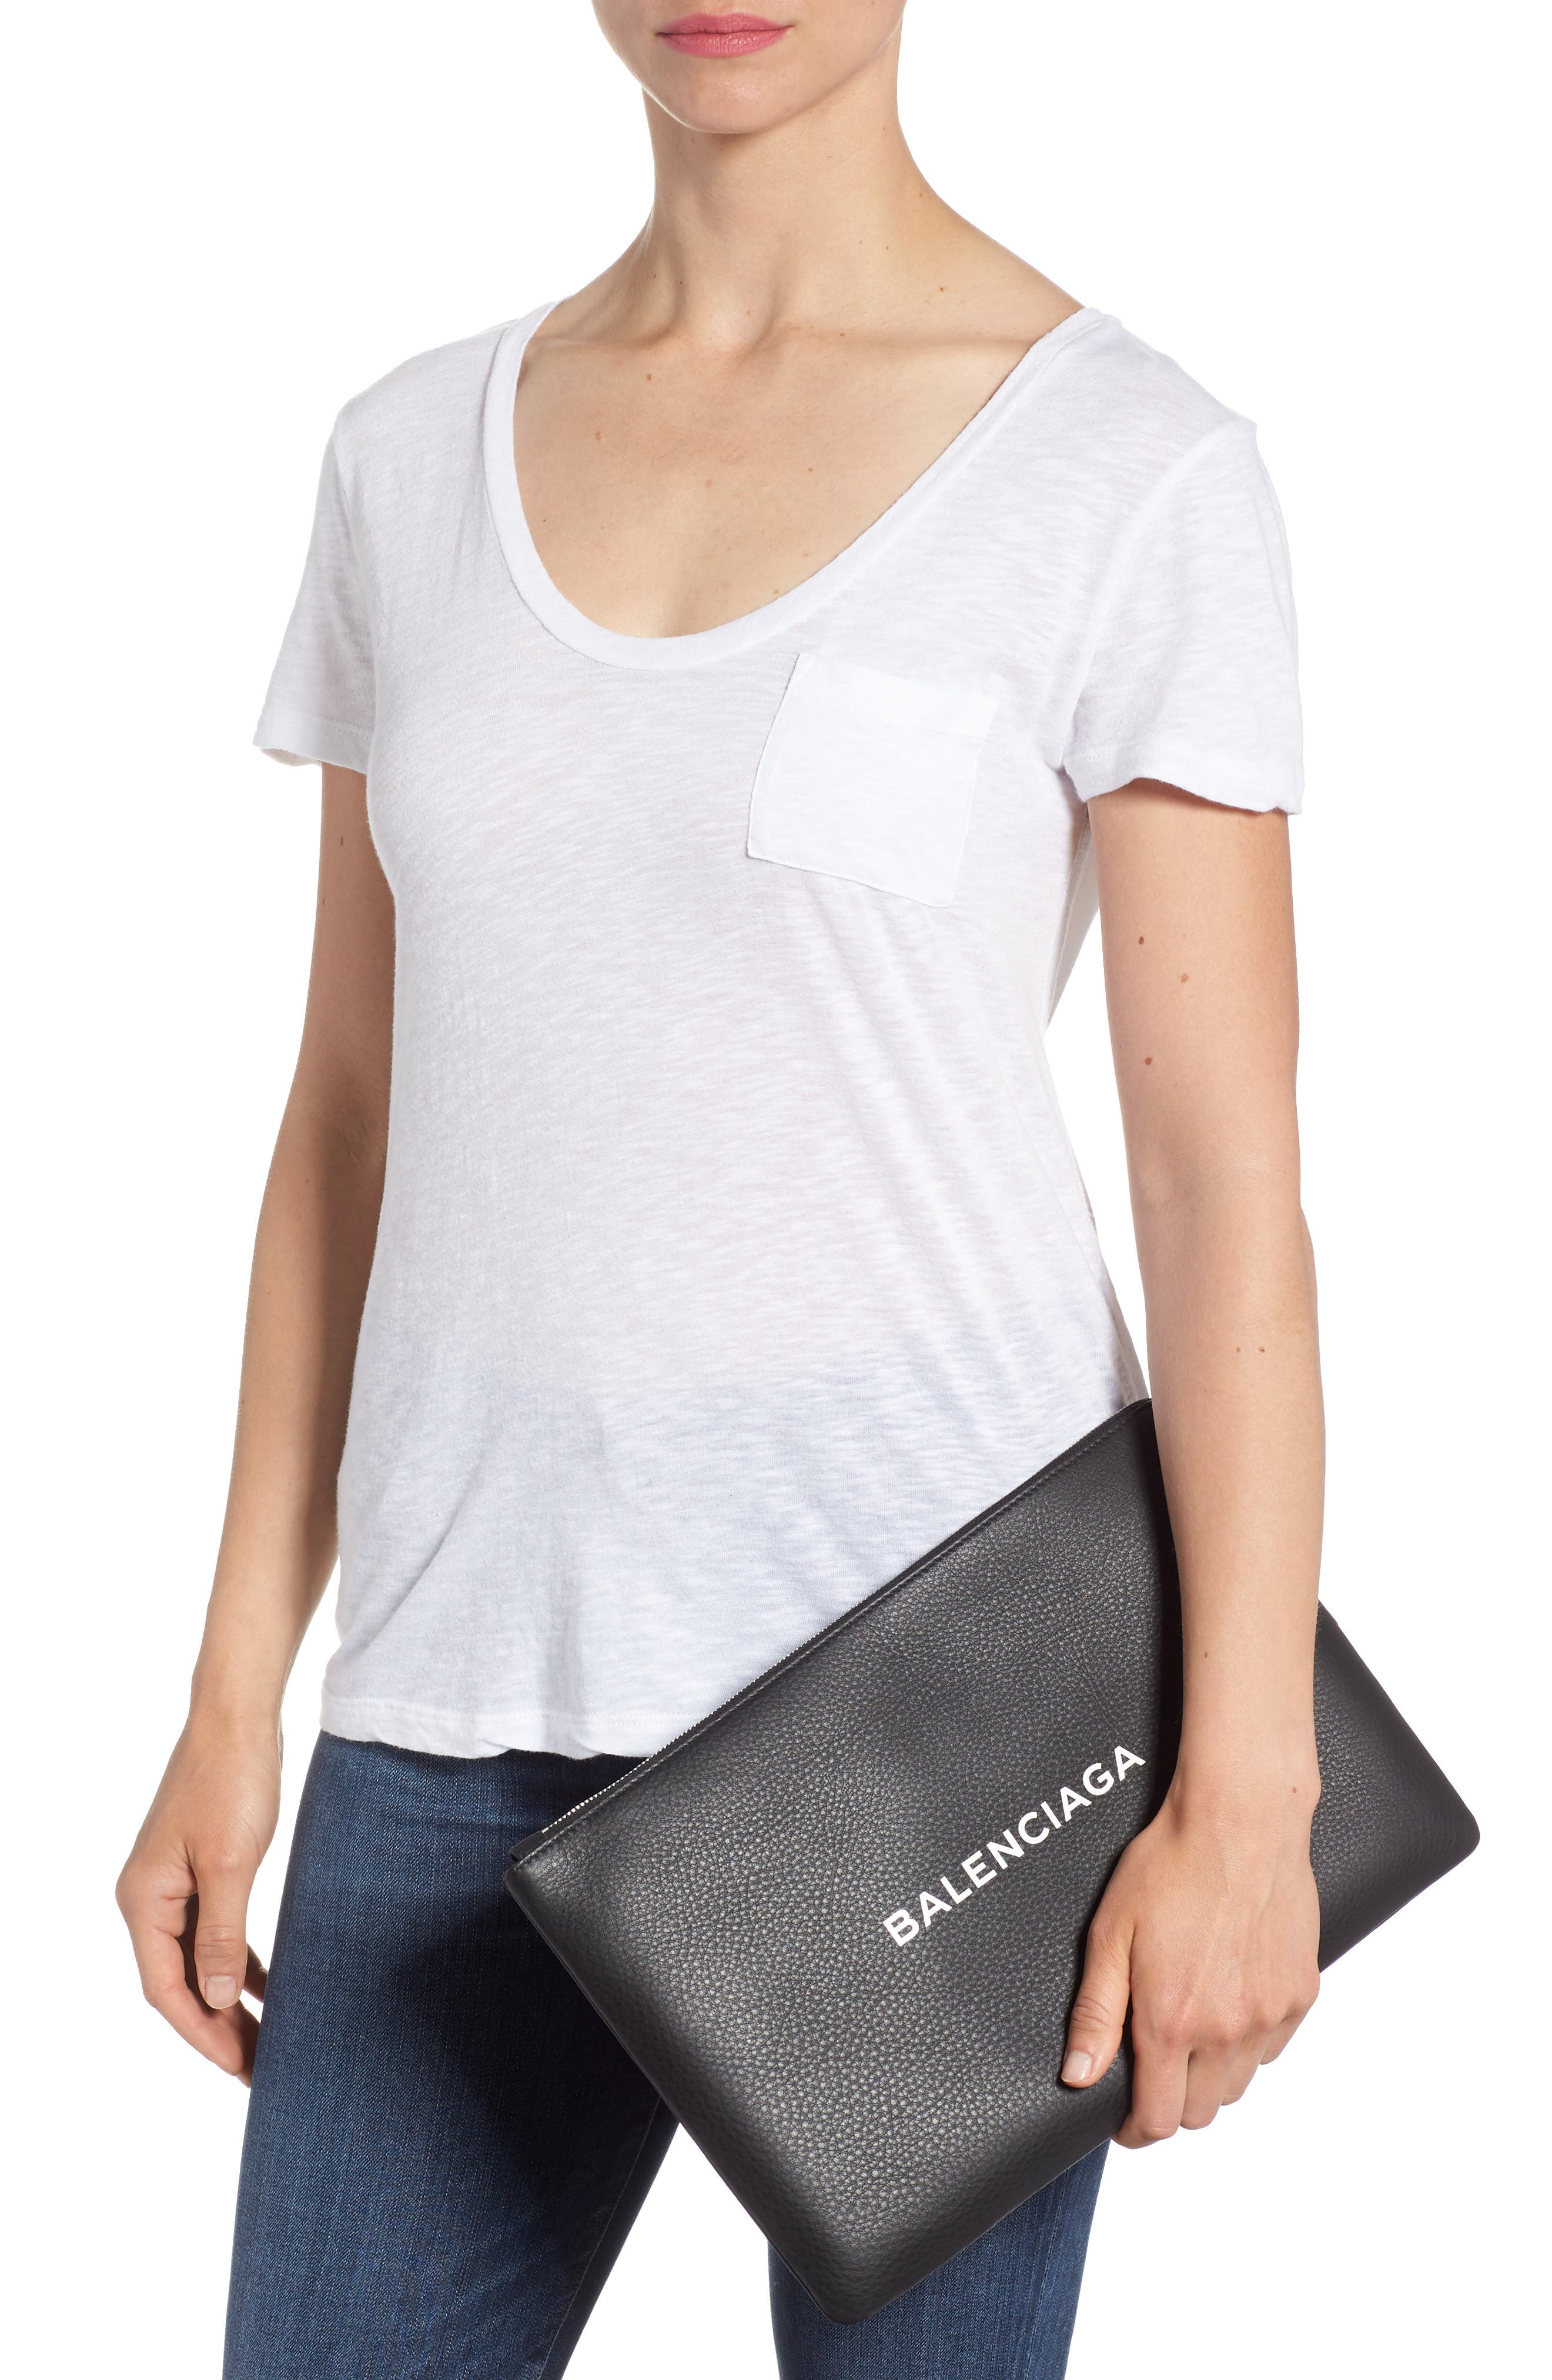 Balencia Large Everyday Leather Pouch,                             Alternate thumbnail 2, color,                             NOIR/ BLANC